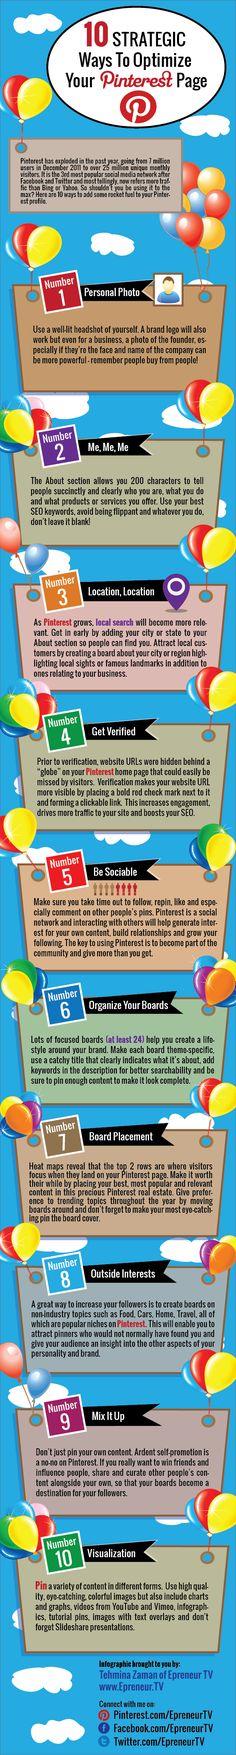 10 estrategias para optimizar tu página en Pinterest